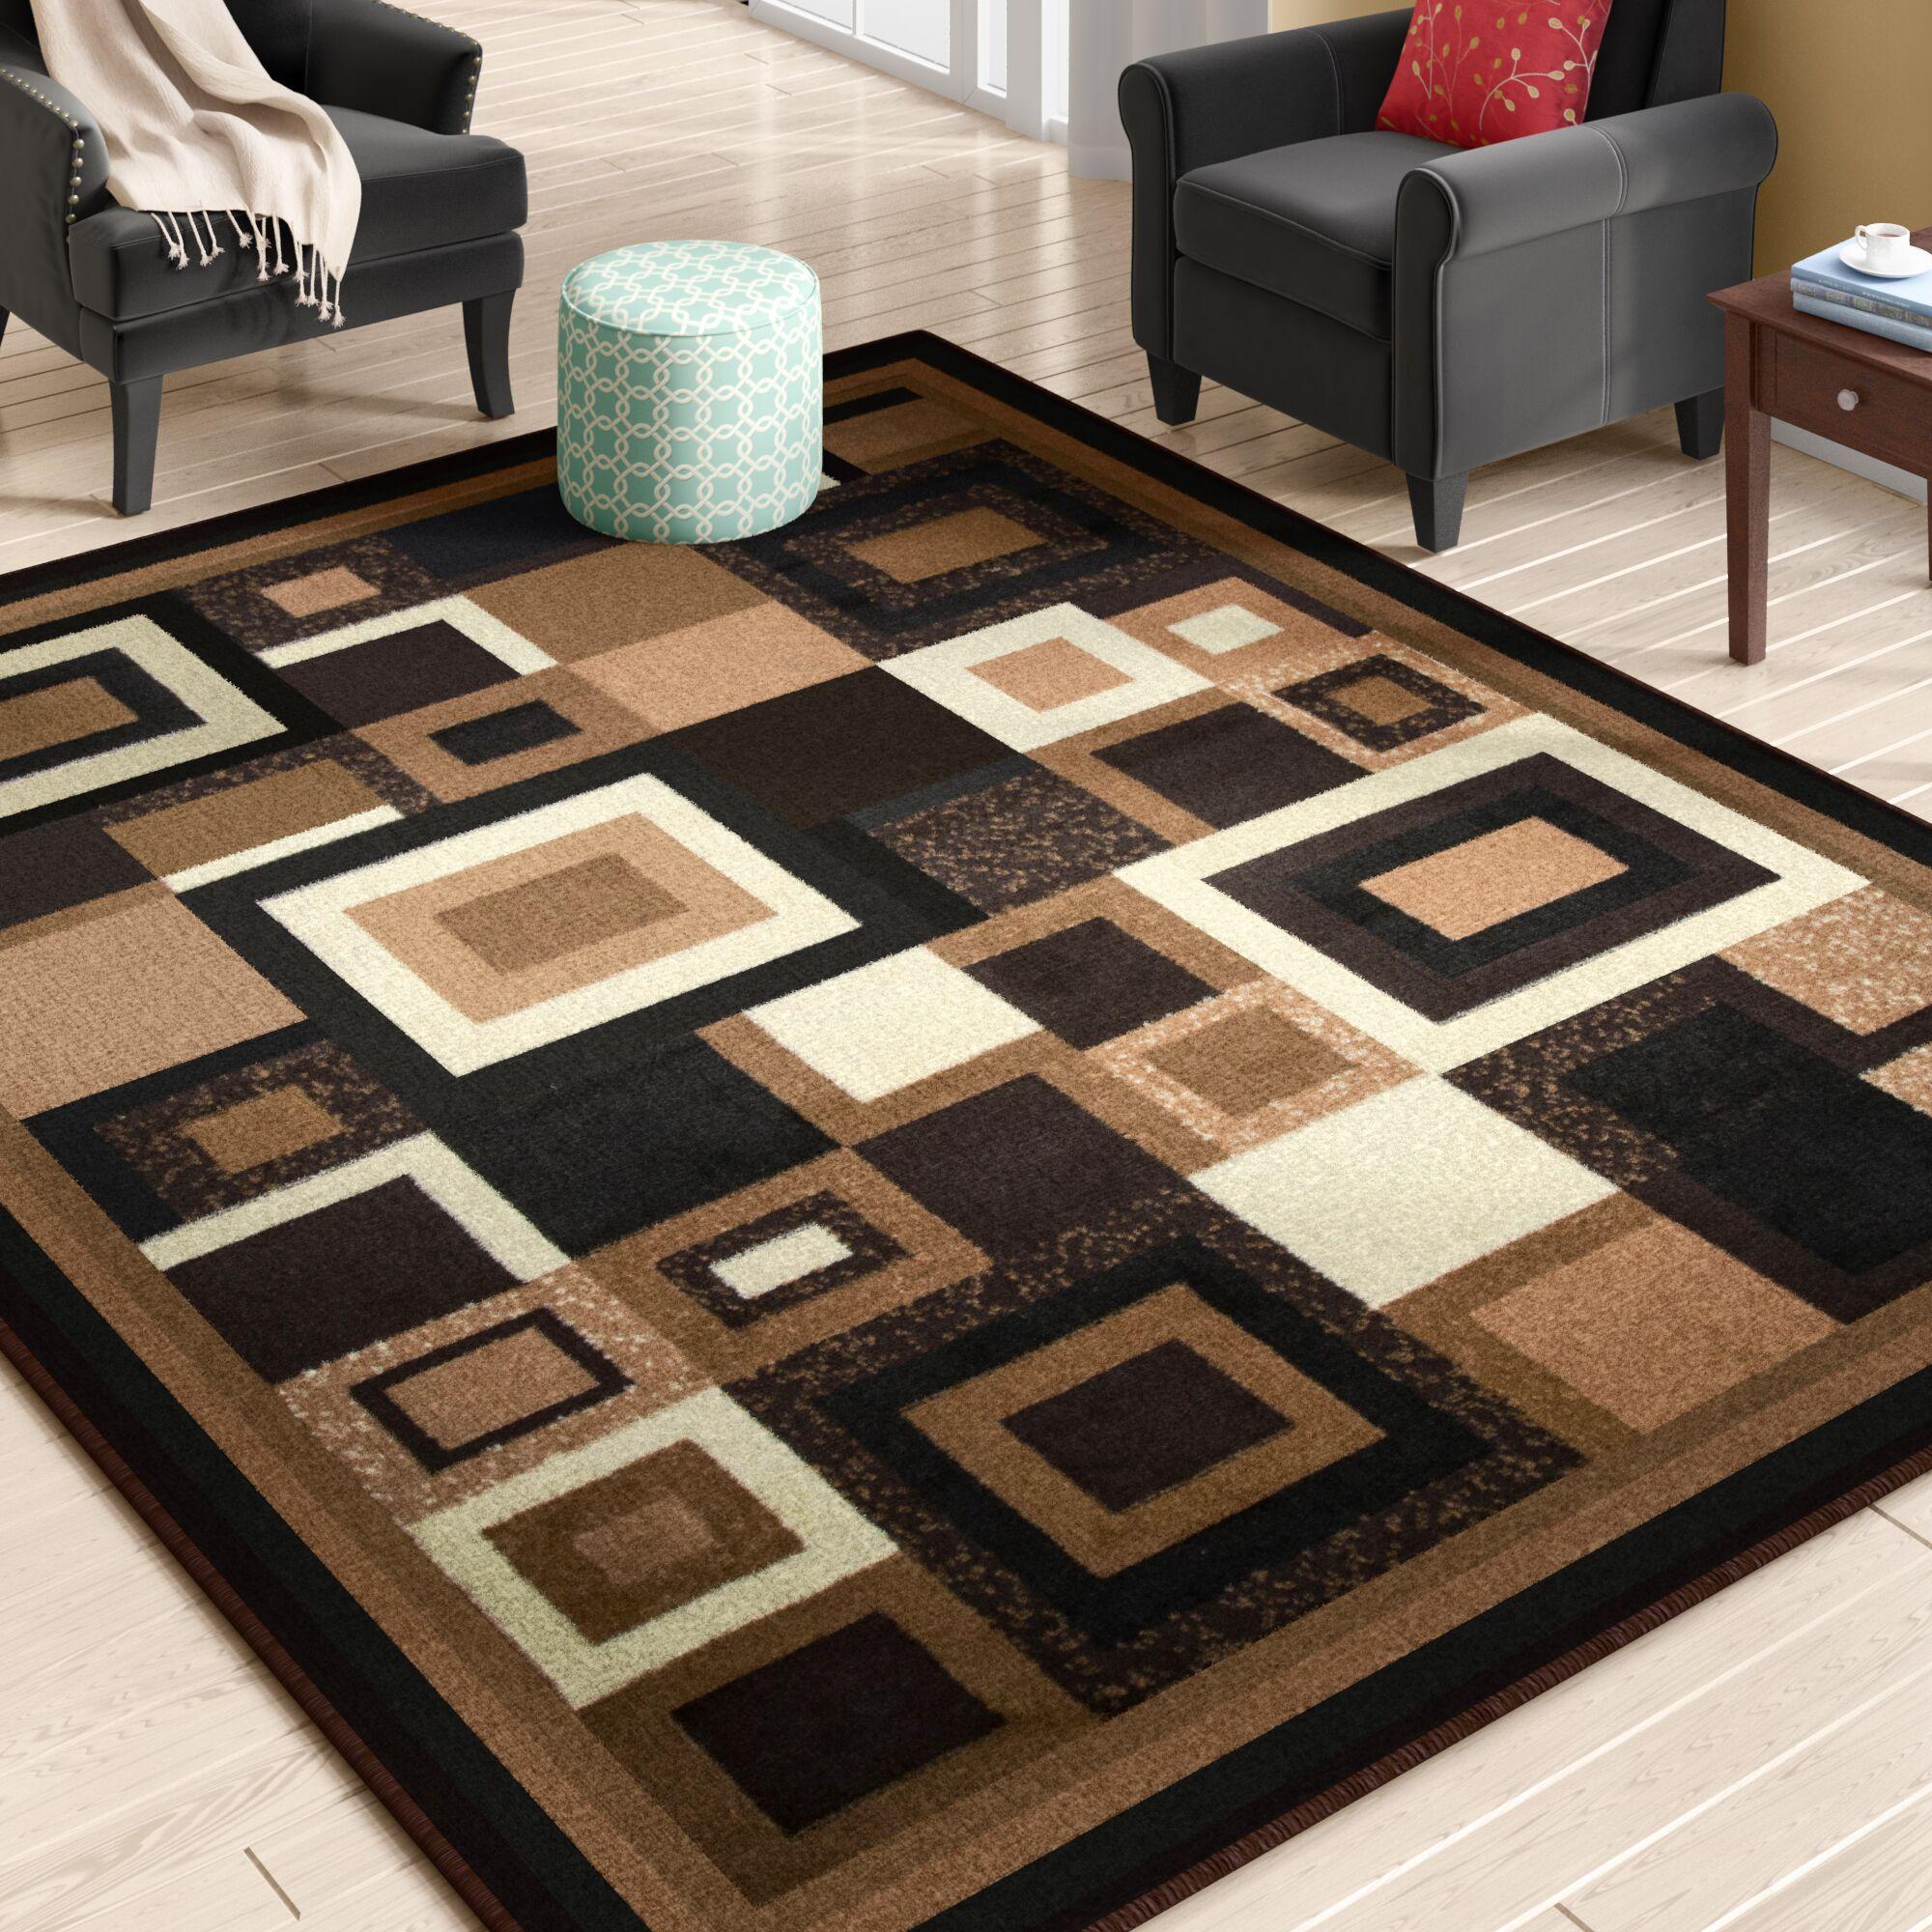 Enedina Quadrilateral Brown/Black/Beige Area Rug Rug Size: 8' x 10'